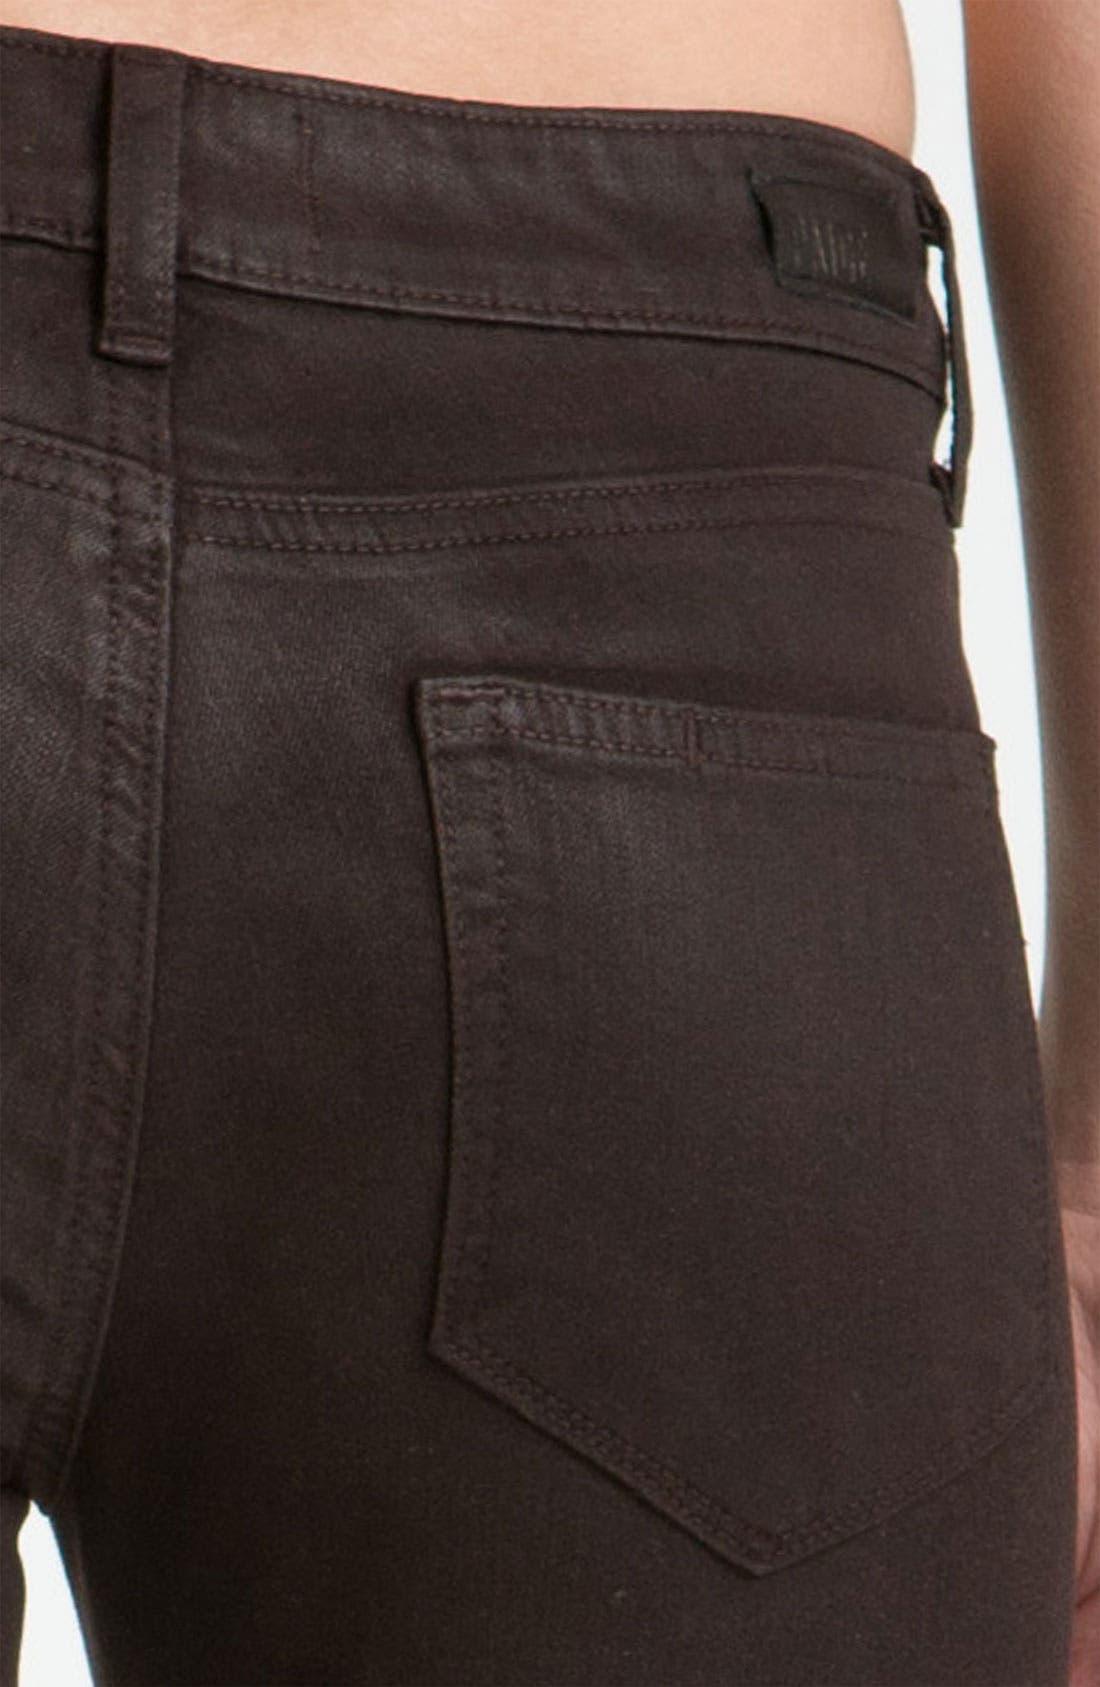 Alternate Image 3  - Paige Denim 'Verdugo' Coated Skinny Jeans (Java)